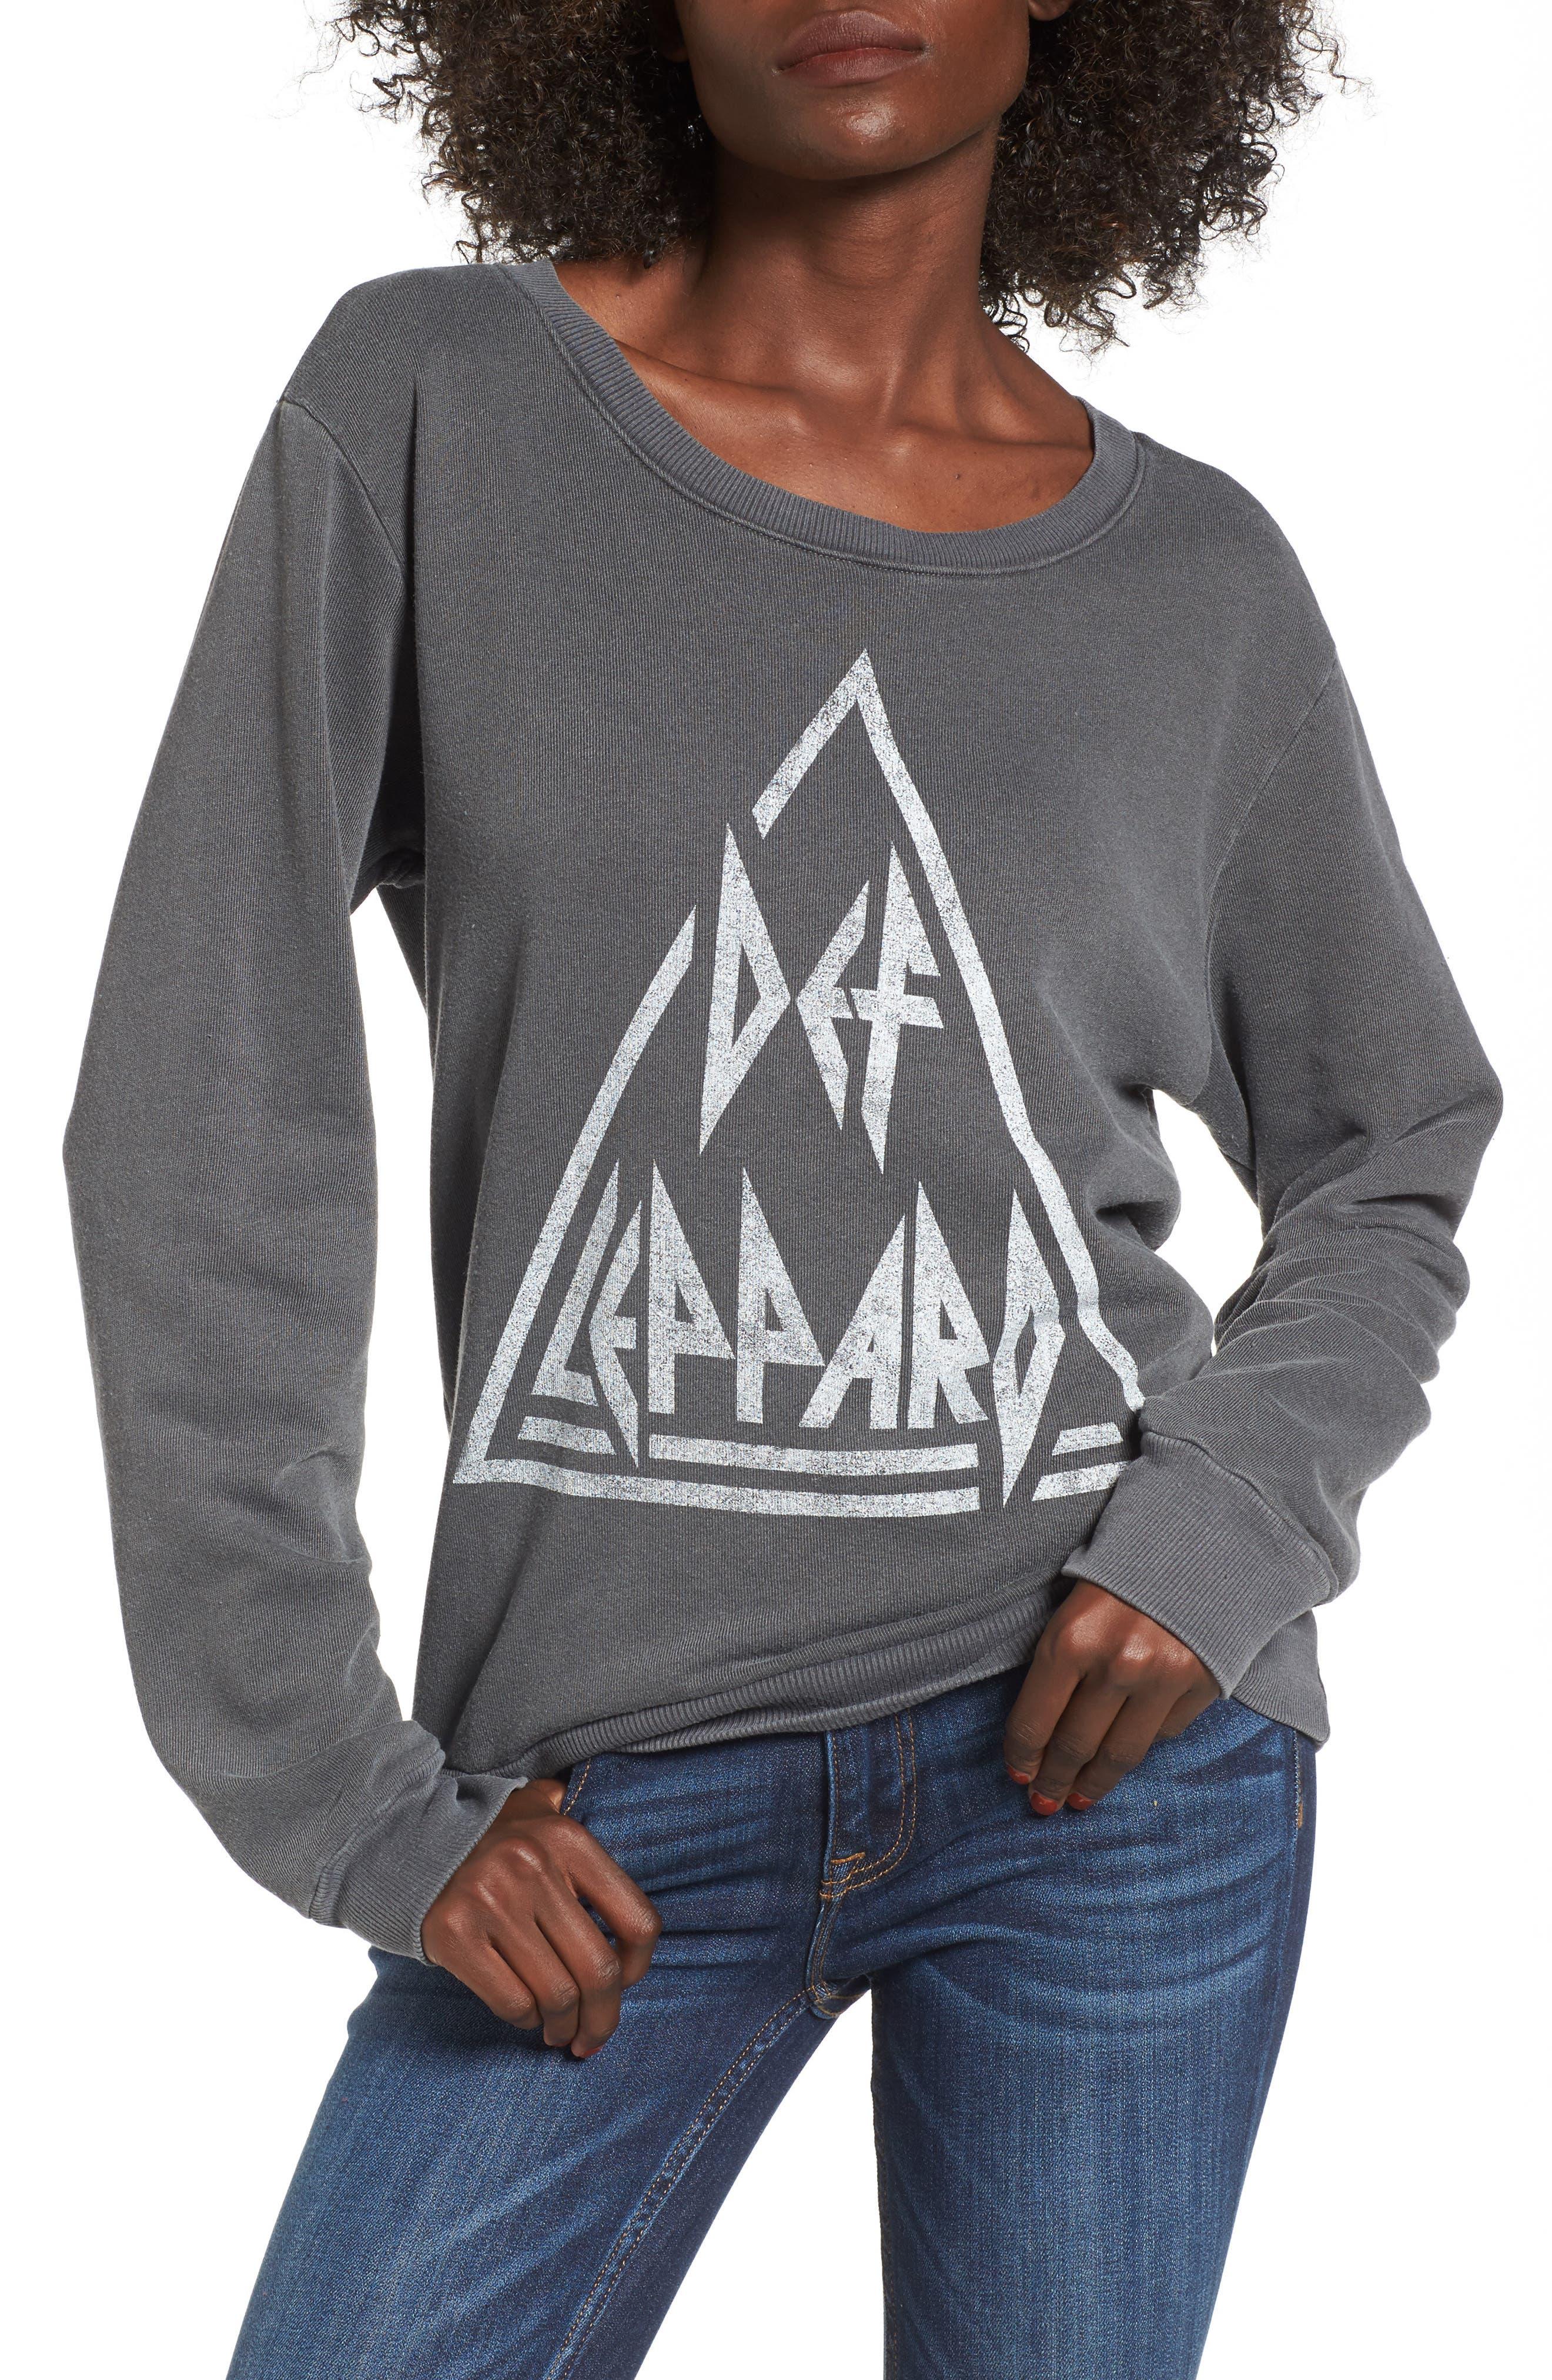 Def Leppard Sweatshirt,                             Main thumbnail 1, color,                             001